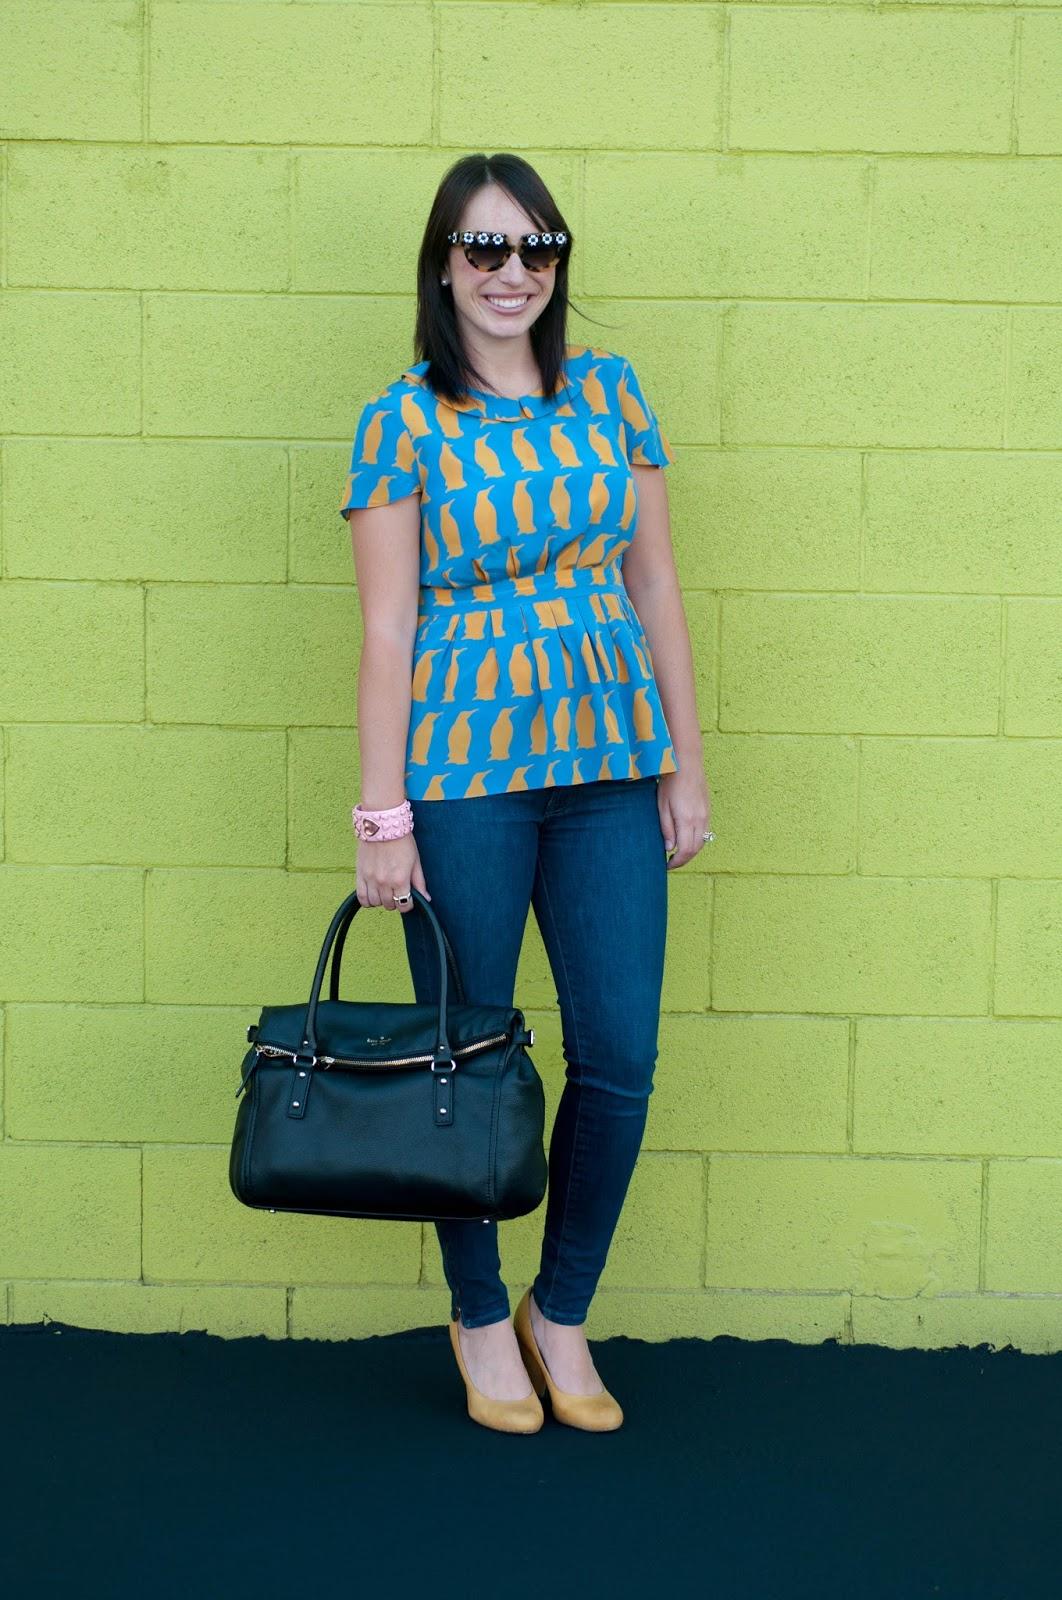 ootd, fashion blog, style blog, charlotte taylor chiffon blouse, anthropologie ootd, prada flower sunglasses, wiw